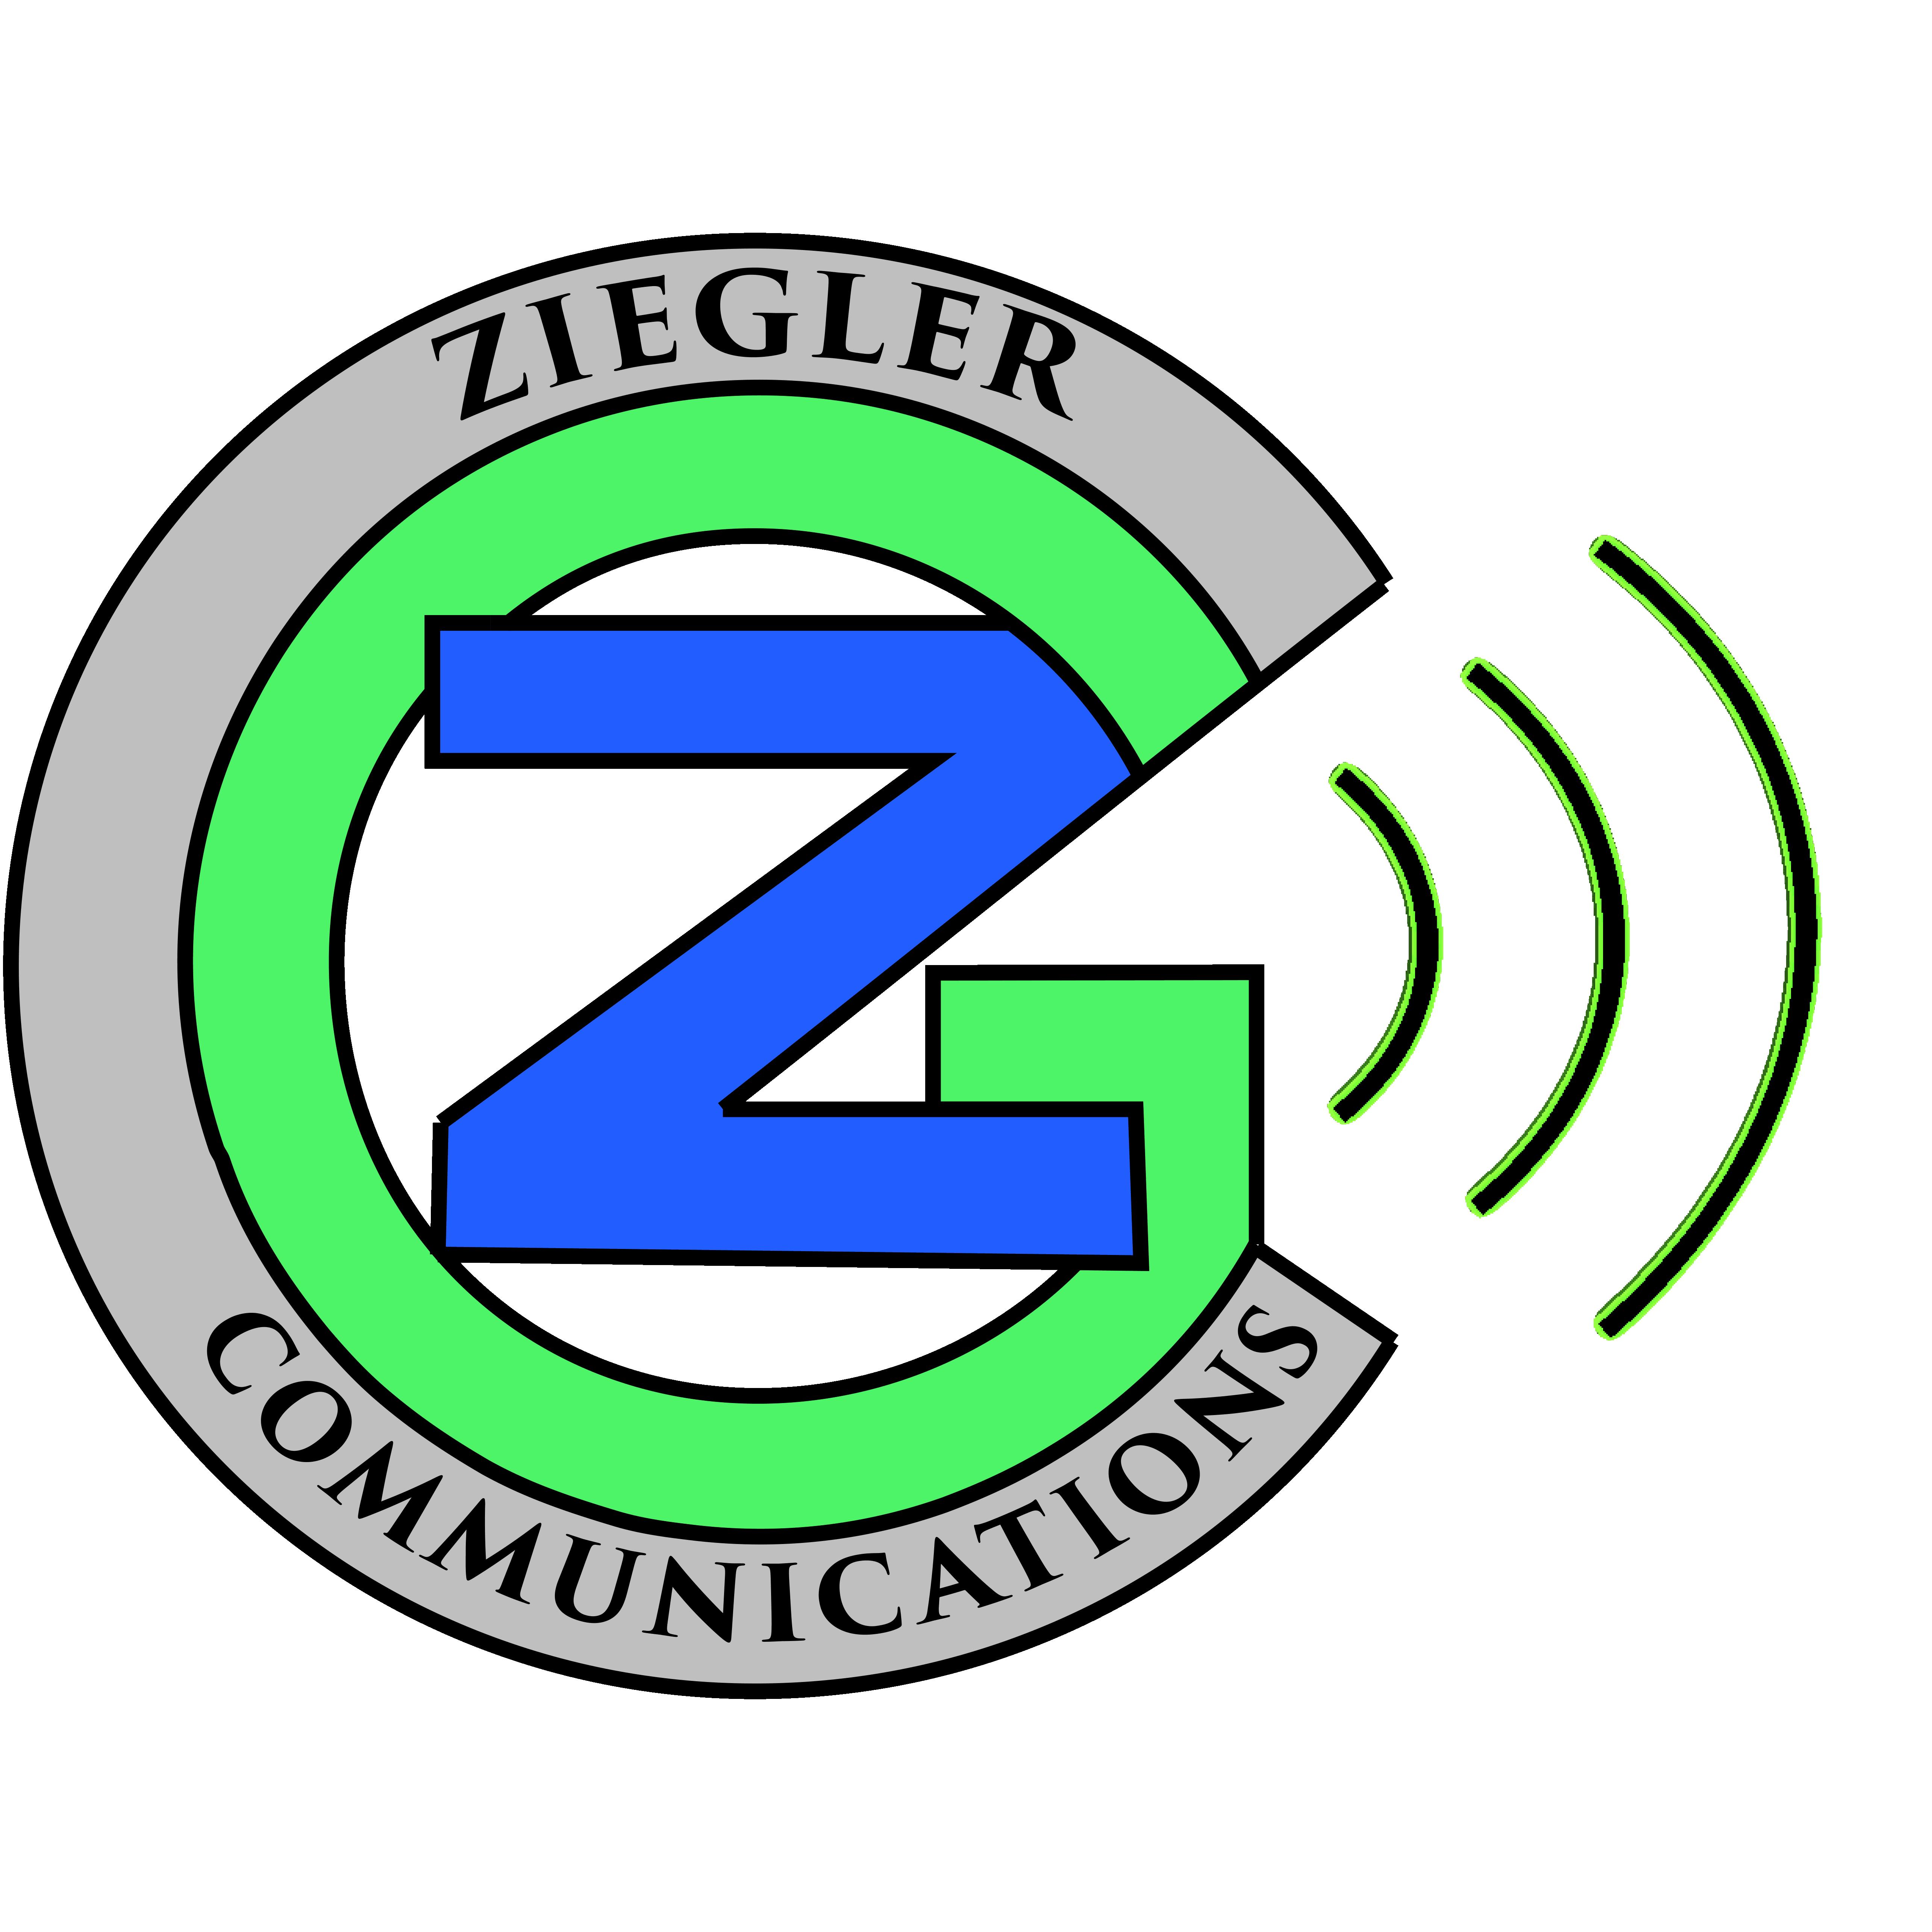 Ziegler Installations Inc. image 5